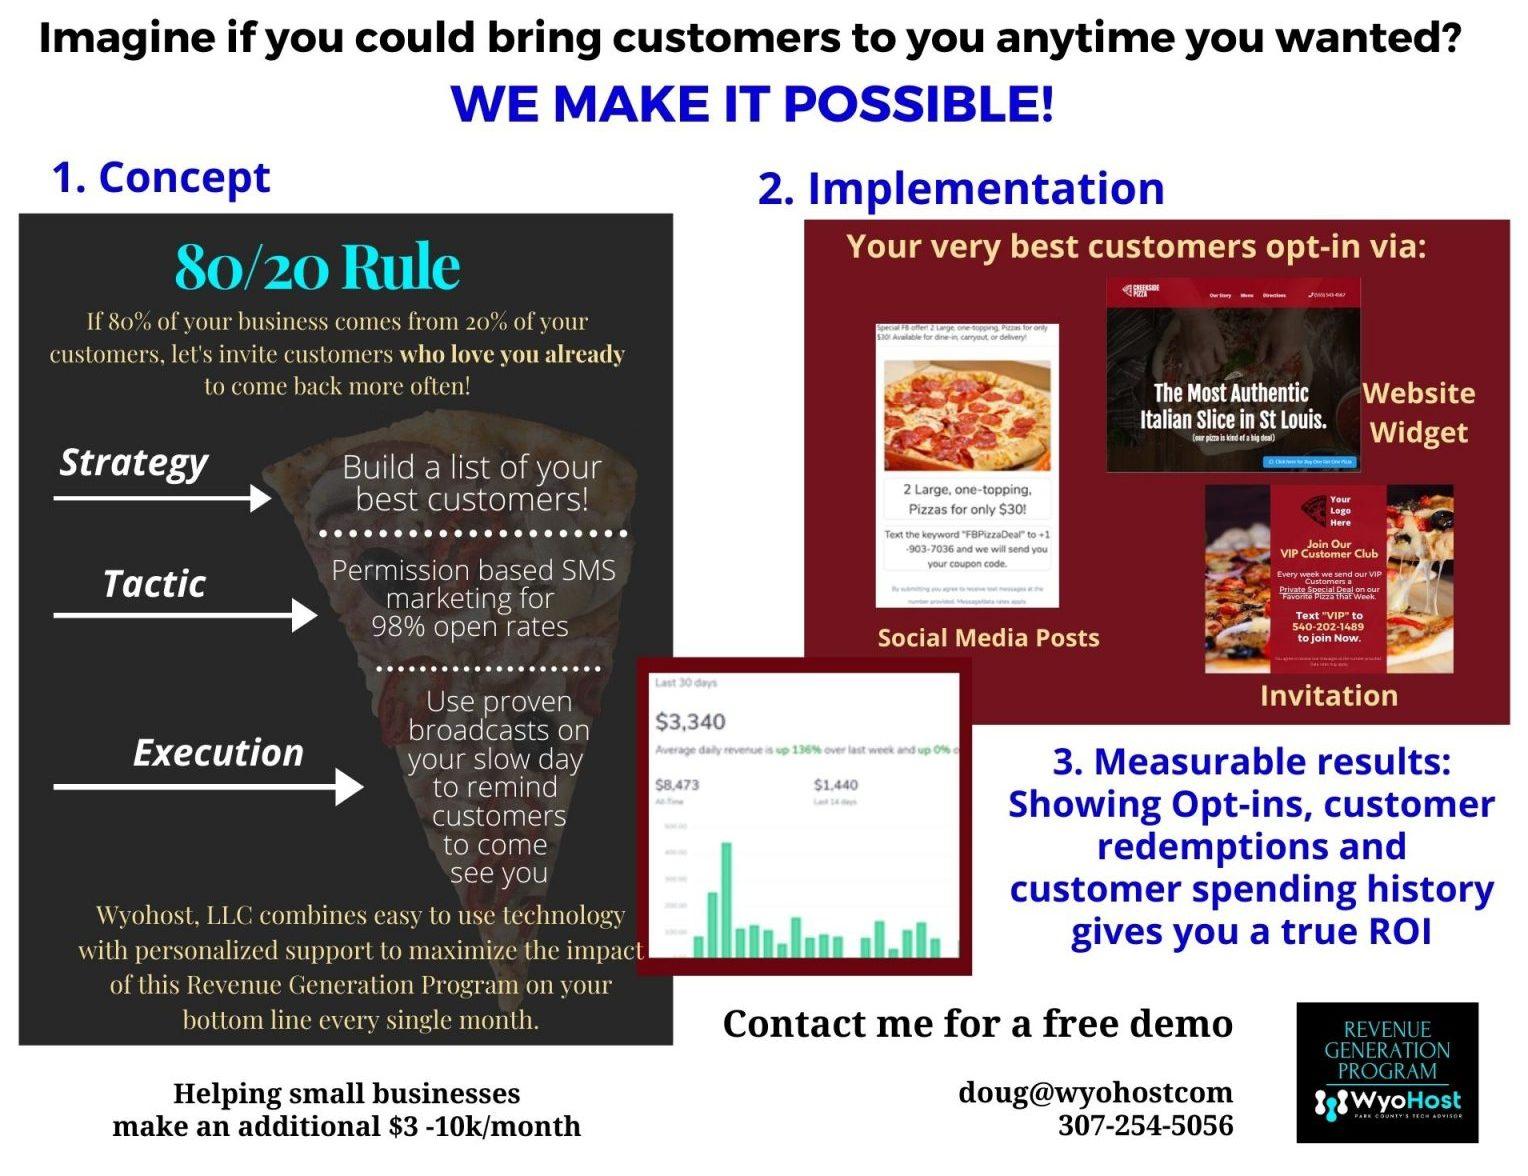 Copy of Revenue Generation Overview 1 e1605857009153